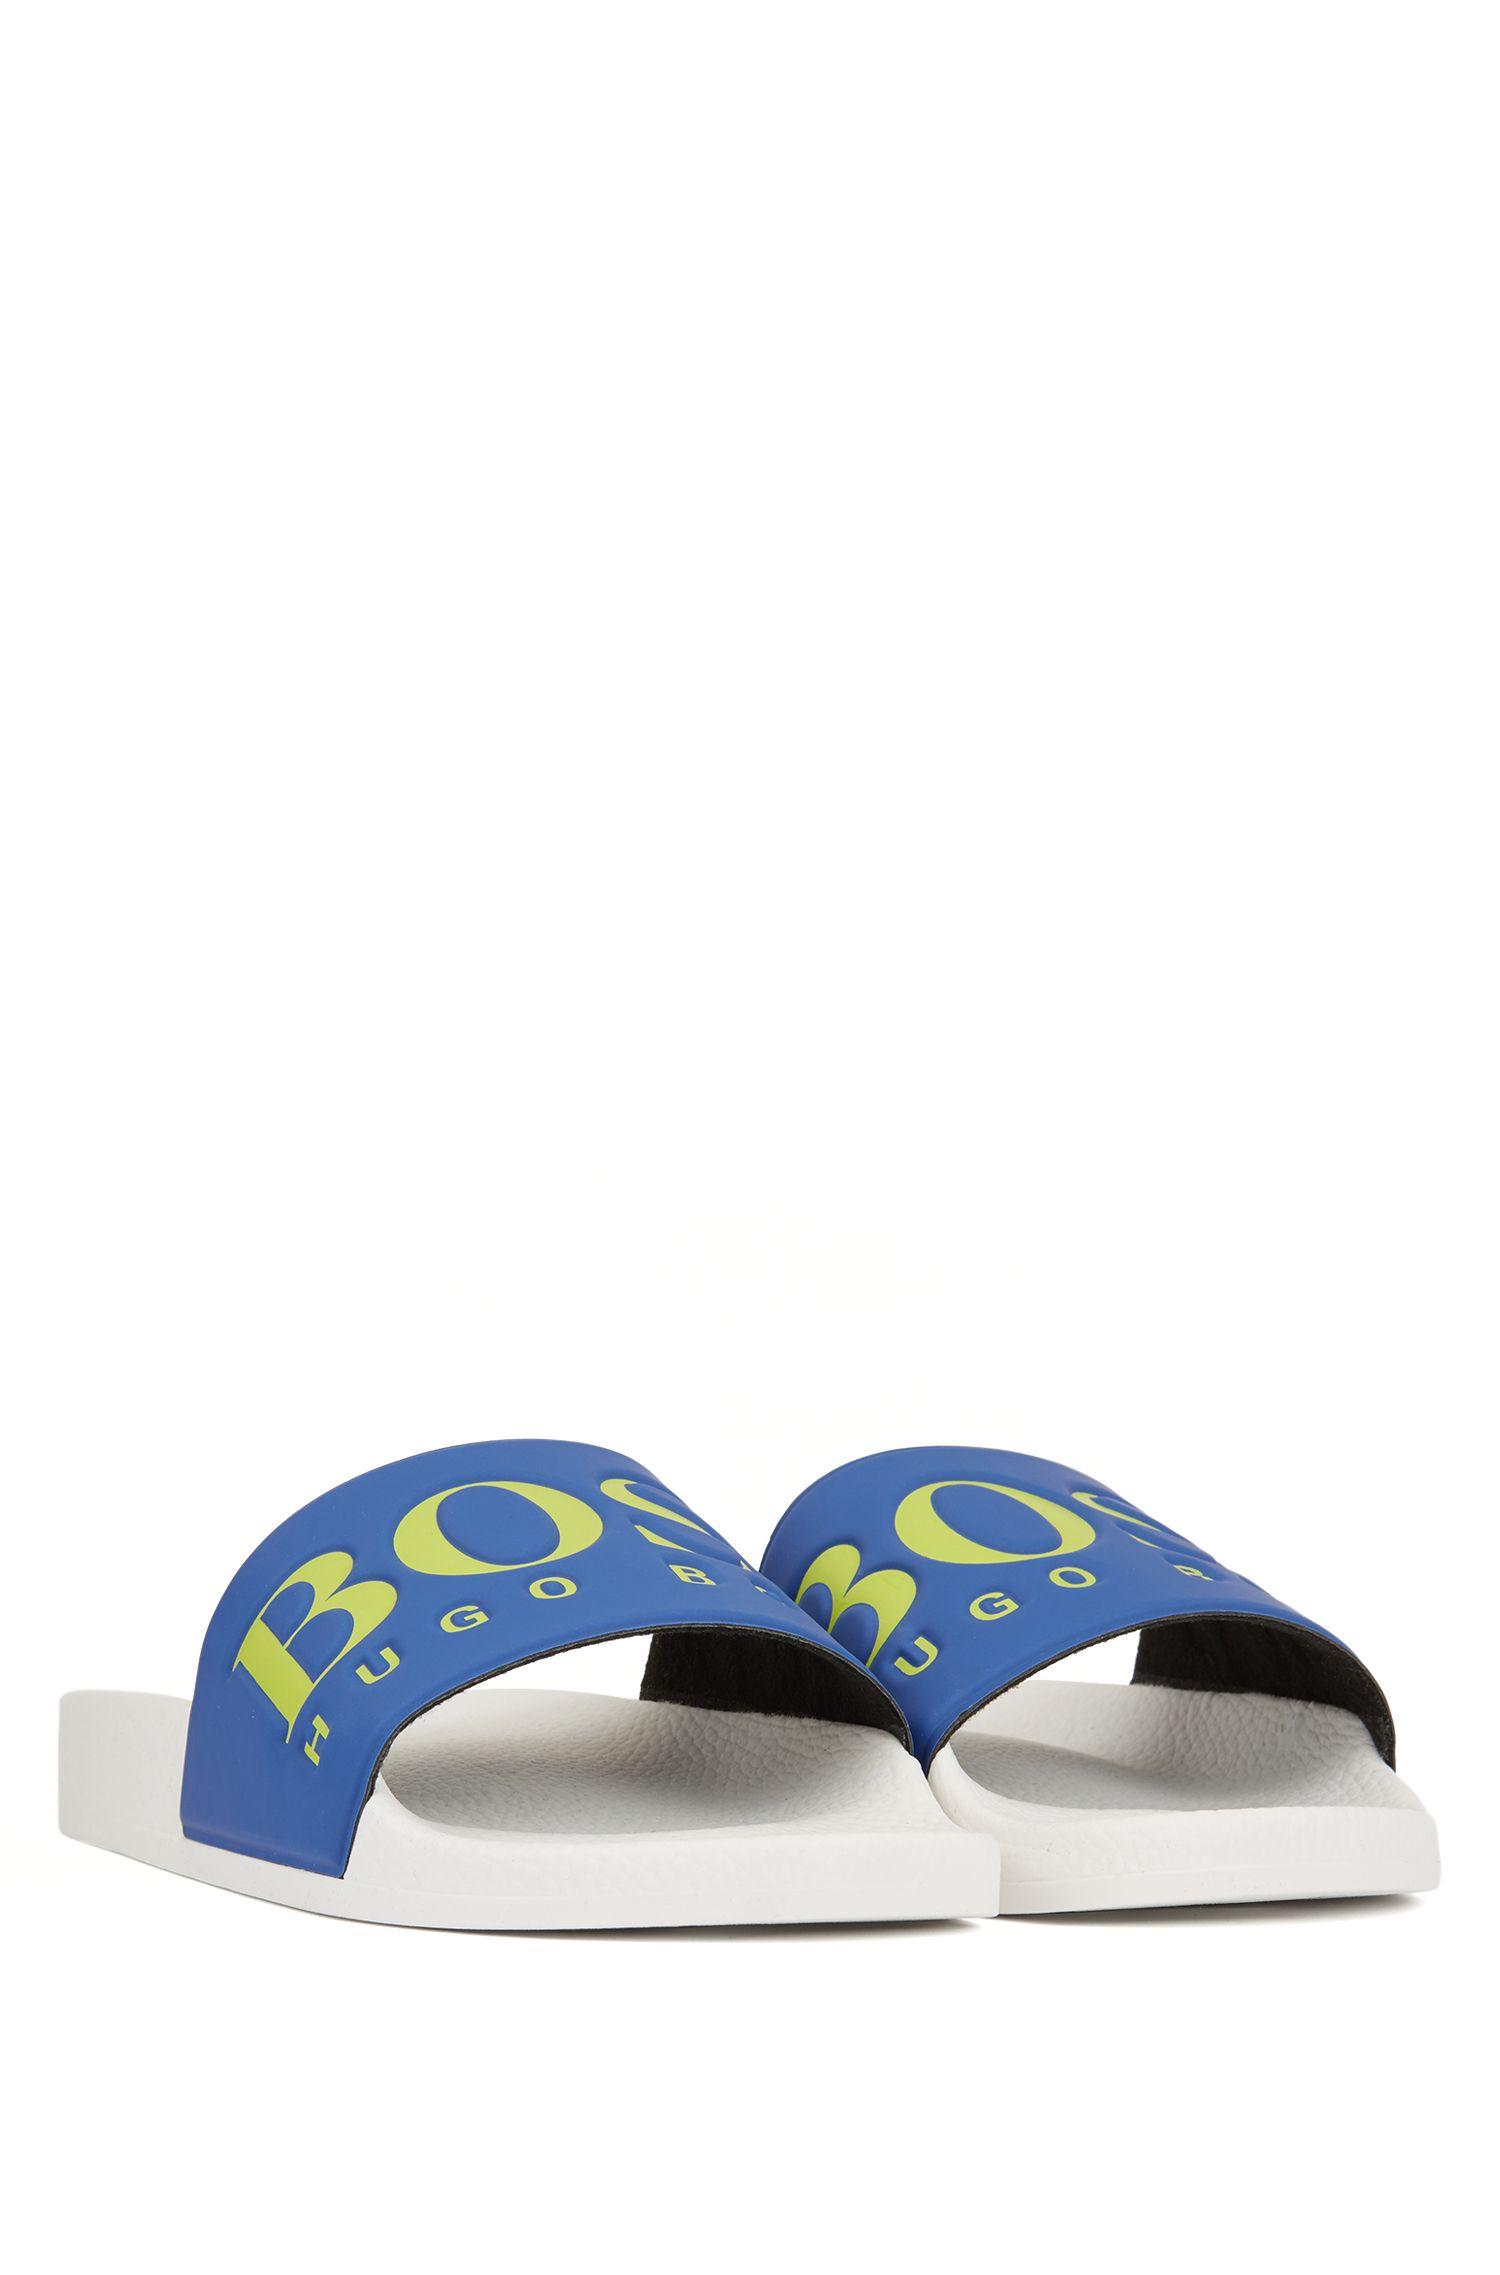 Hugo Boss - Italian-made rubber slide sandals with contrast logo - 2